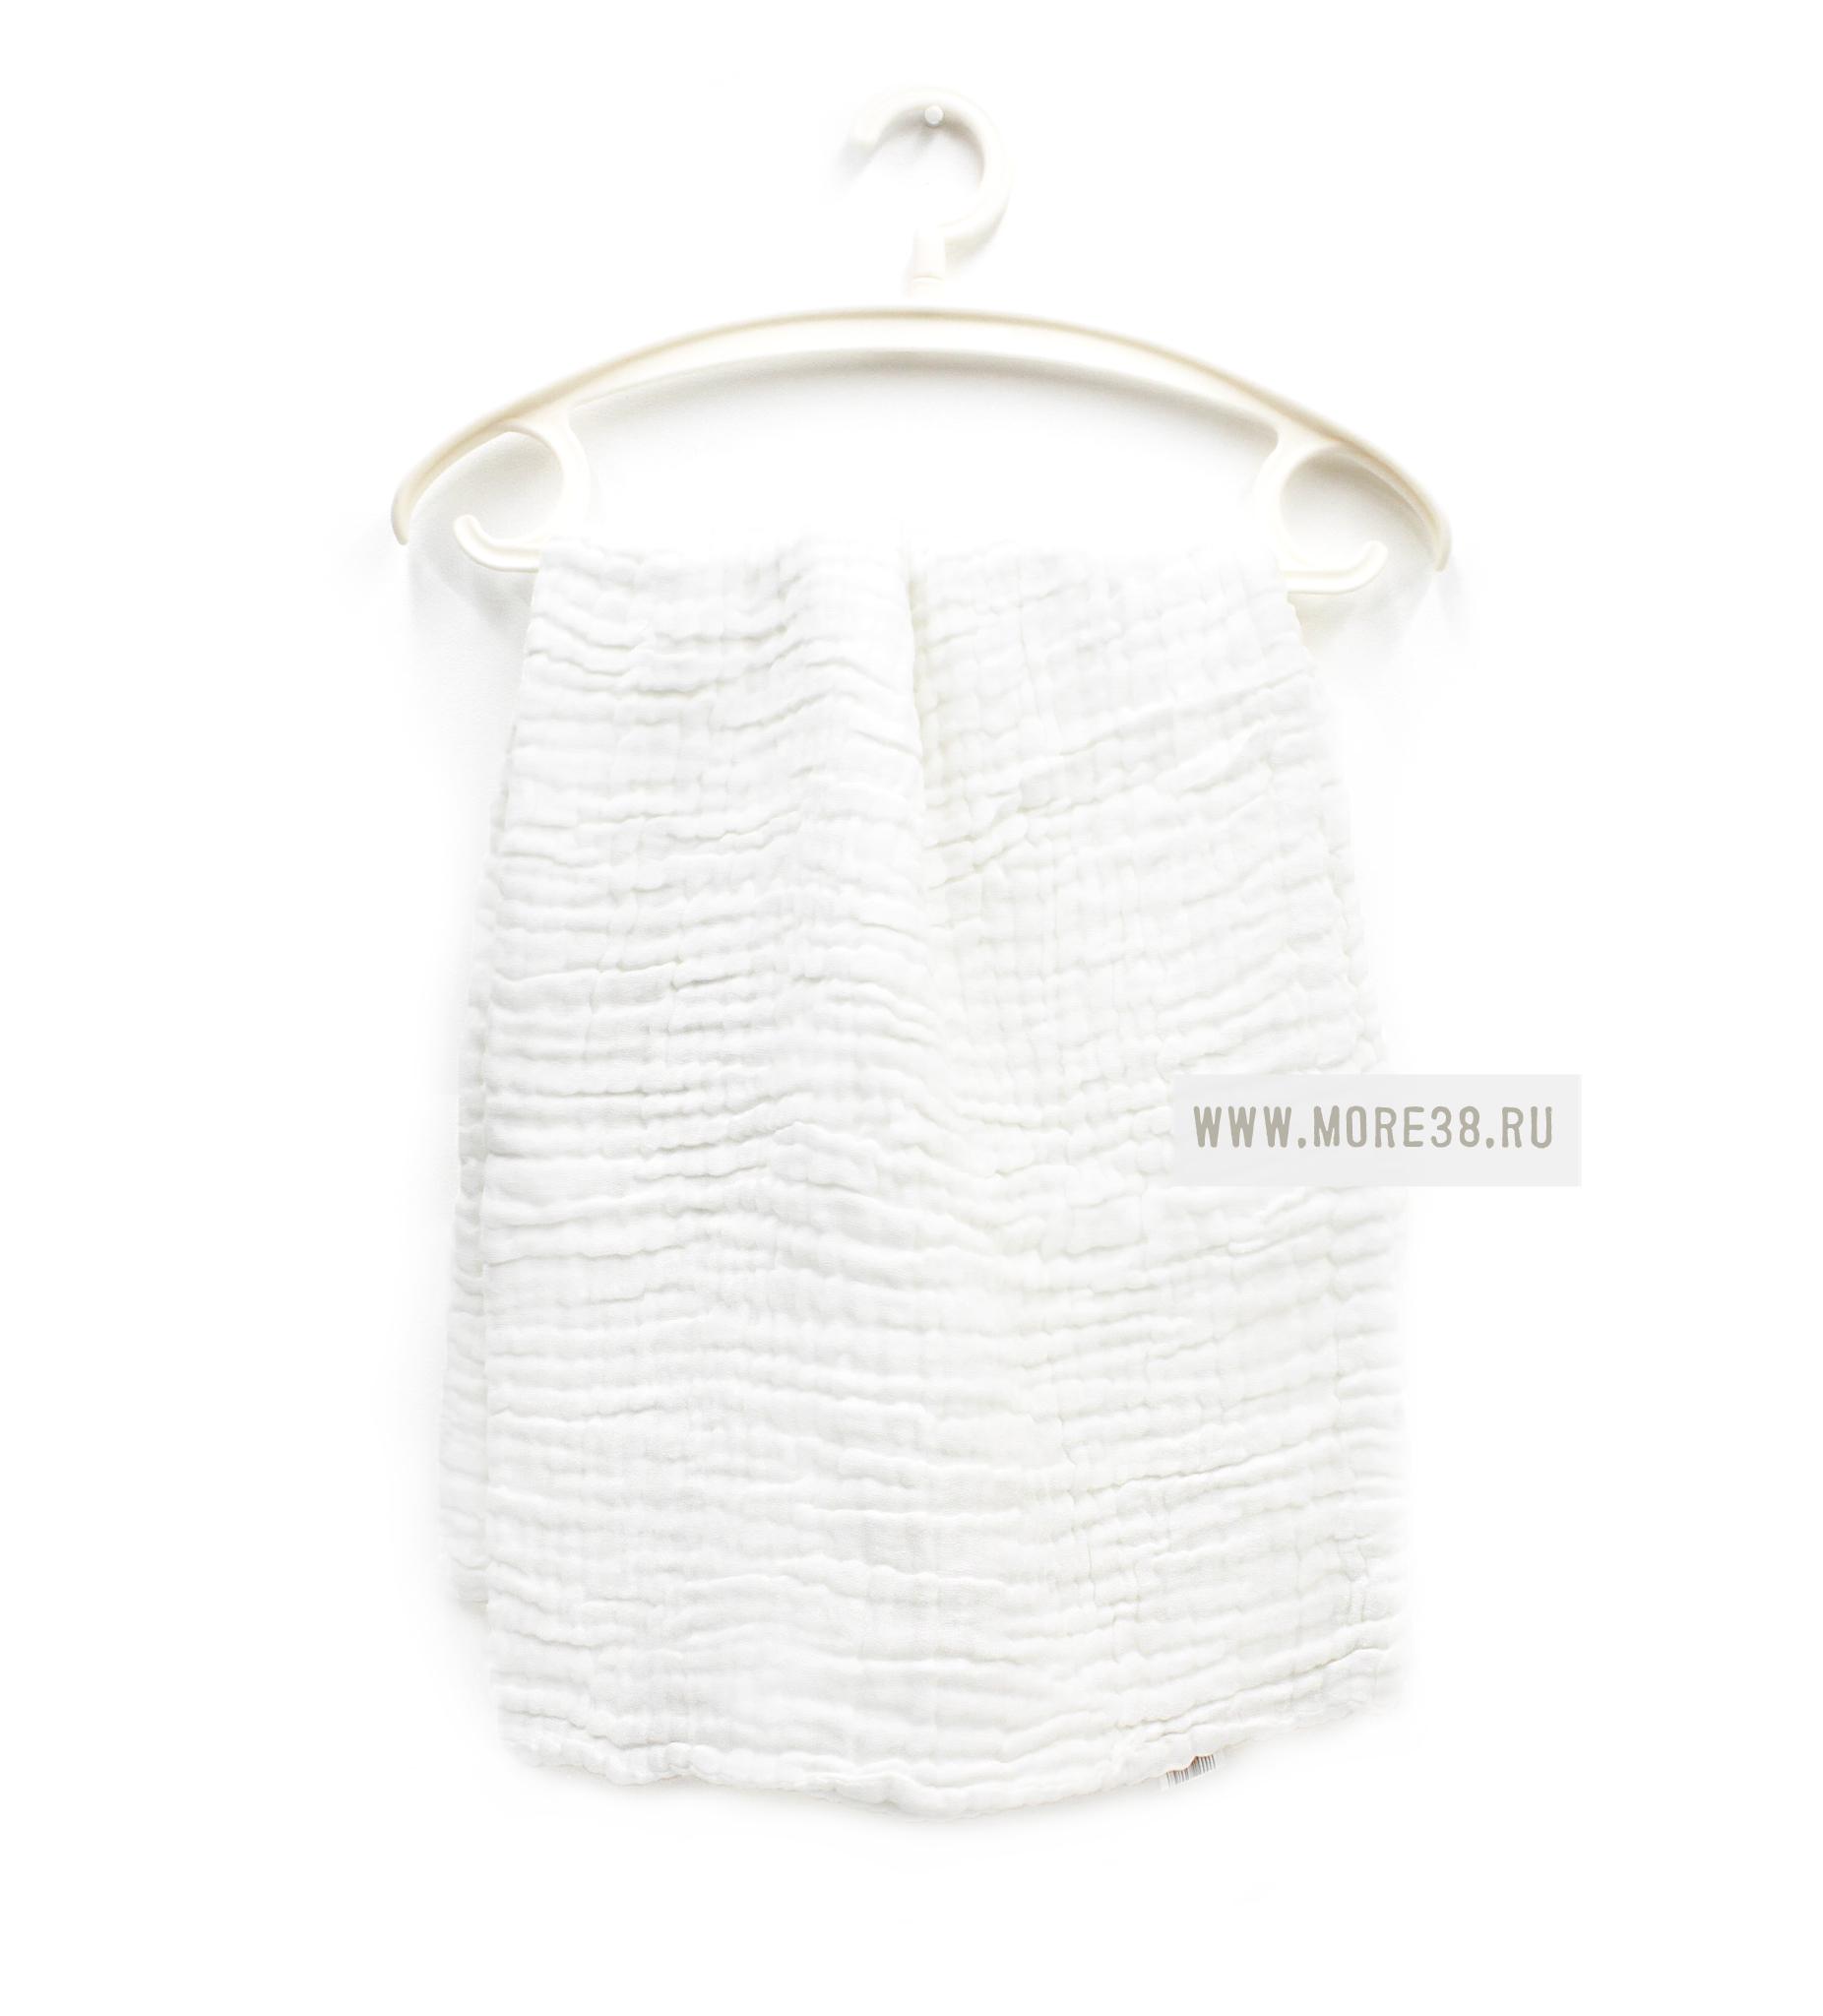 Муслиновое одеялко,6 слоёв-белое(100х100 см)